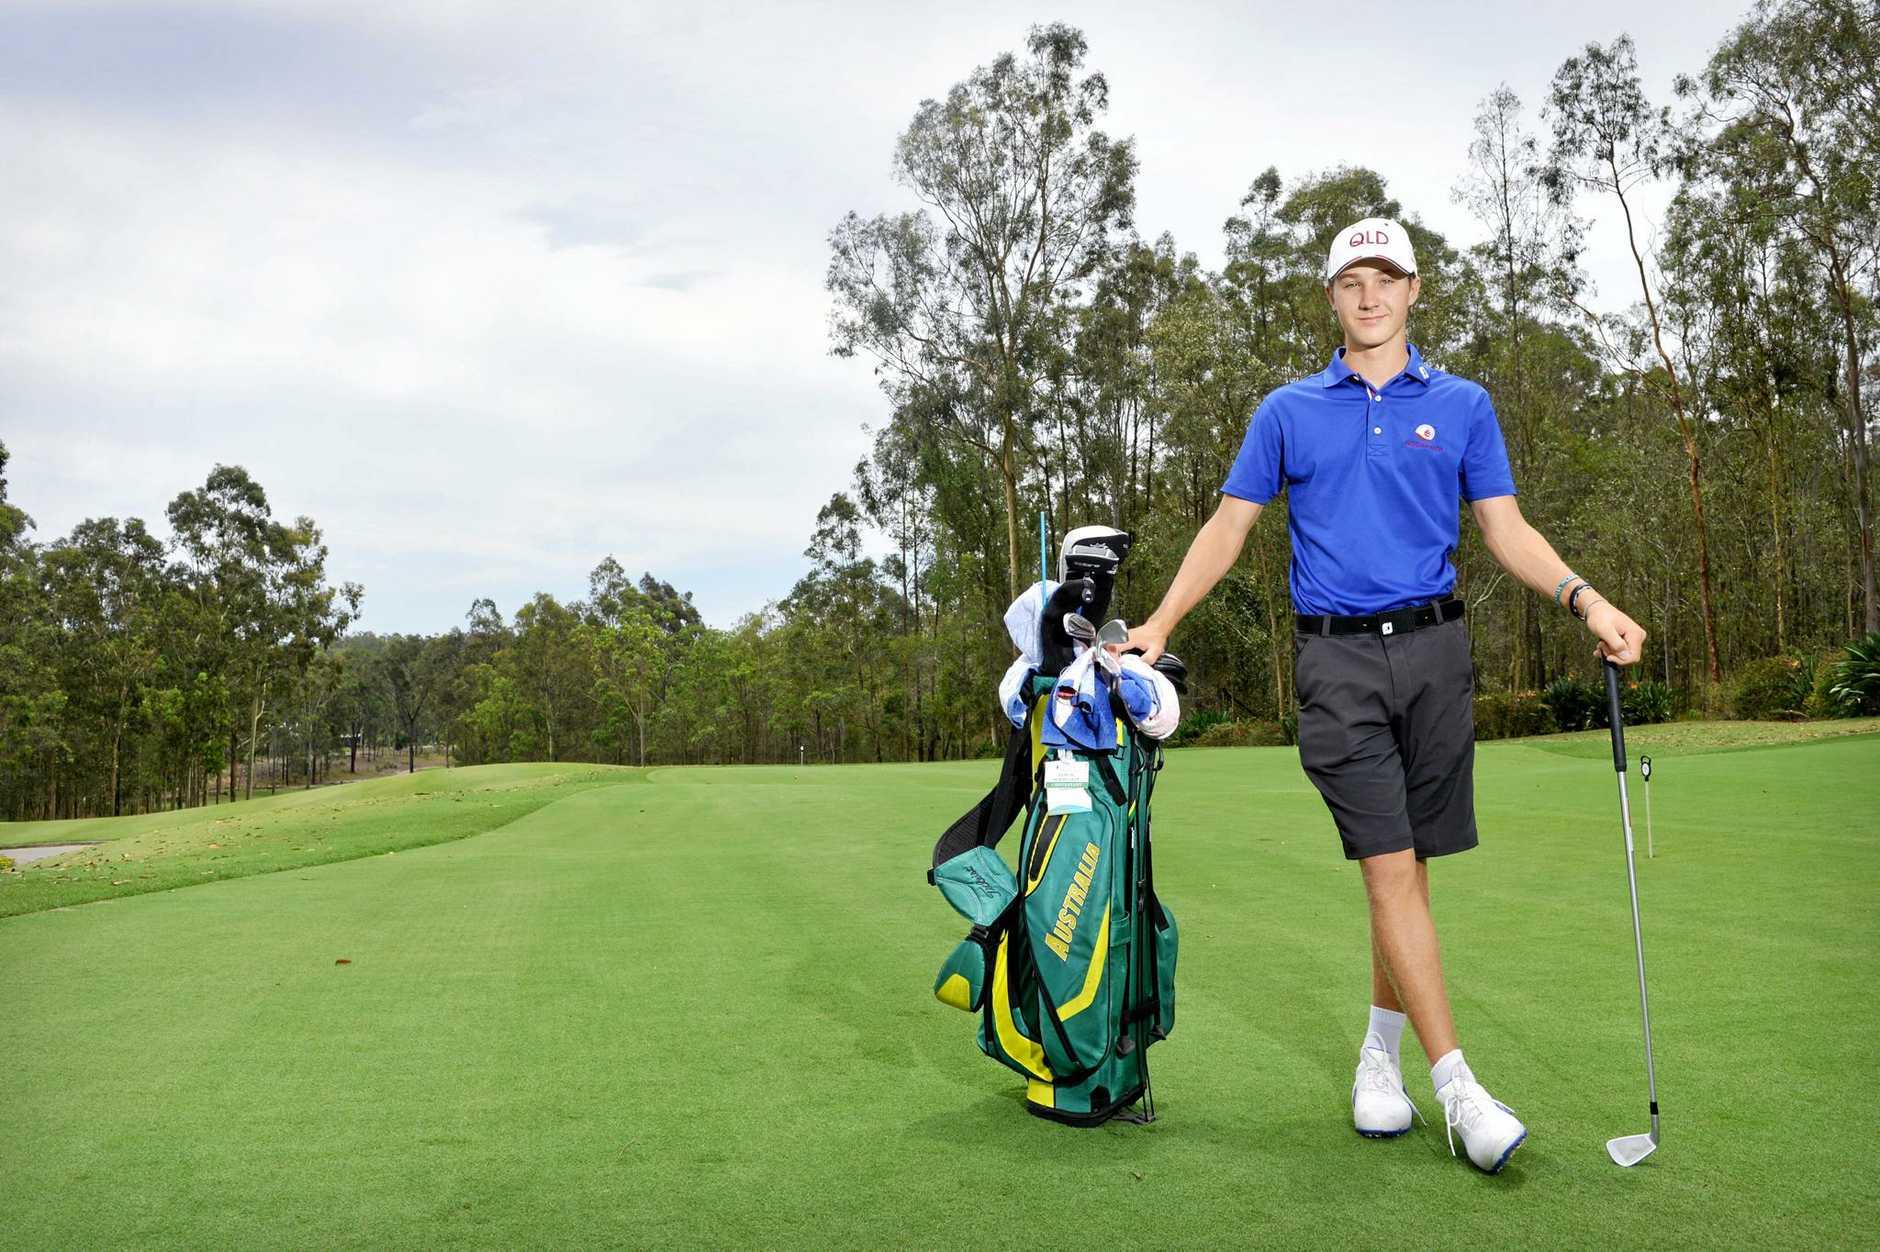 Golfer Louis Dobbelaar just won New Zealand Ameteur Golf Tournament.